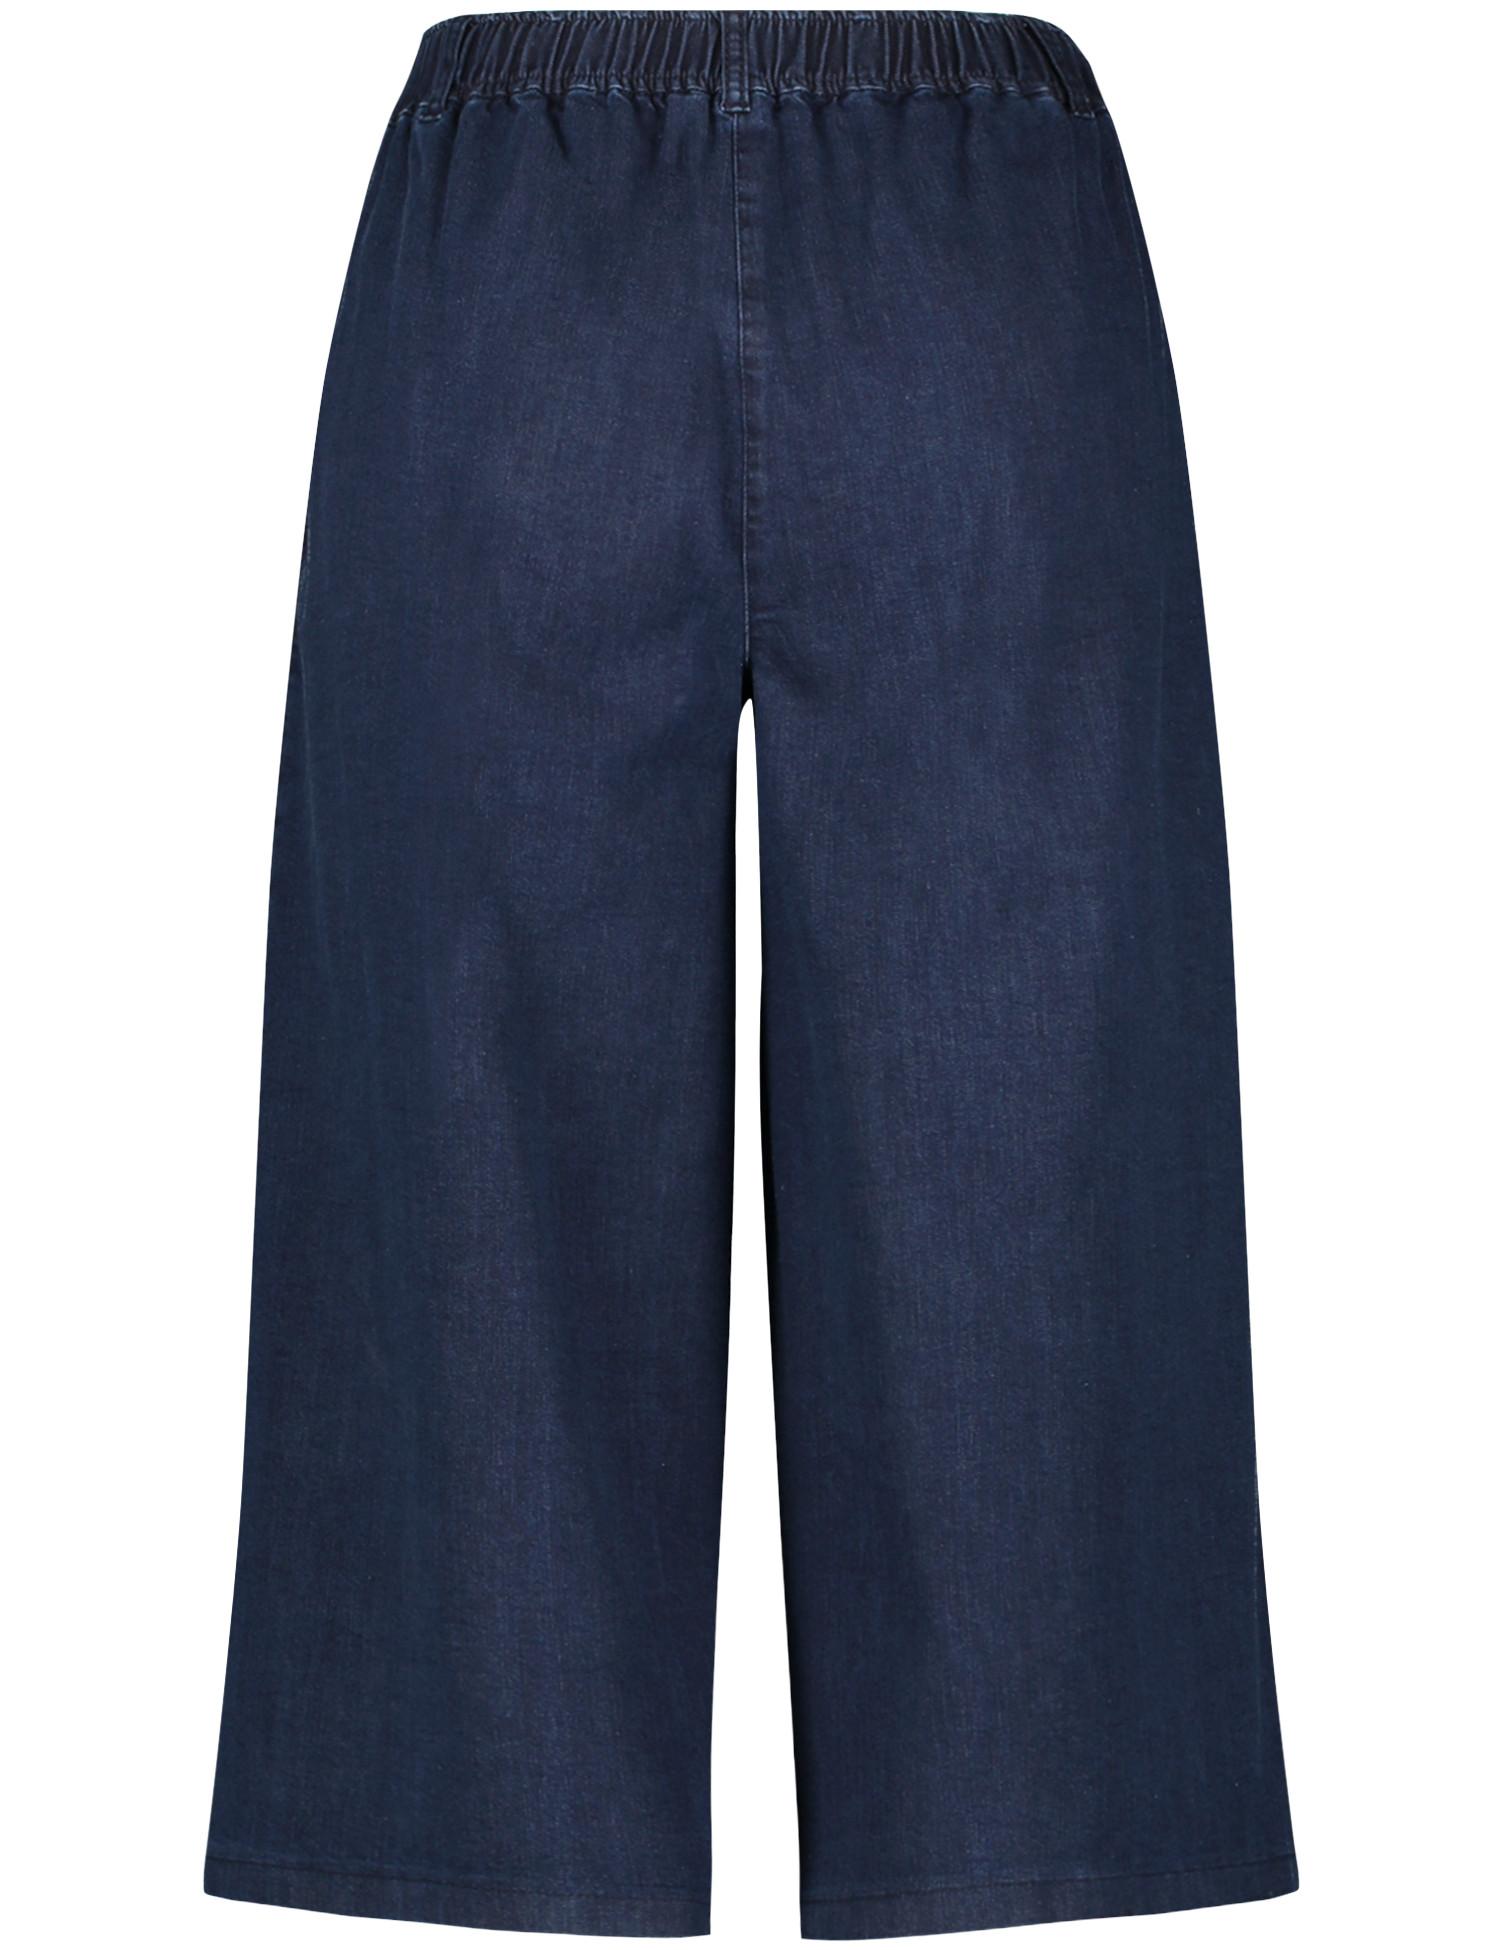 Pantalone Gerry Weber GERRY WEBER   Pantalone   520019-3165183100